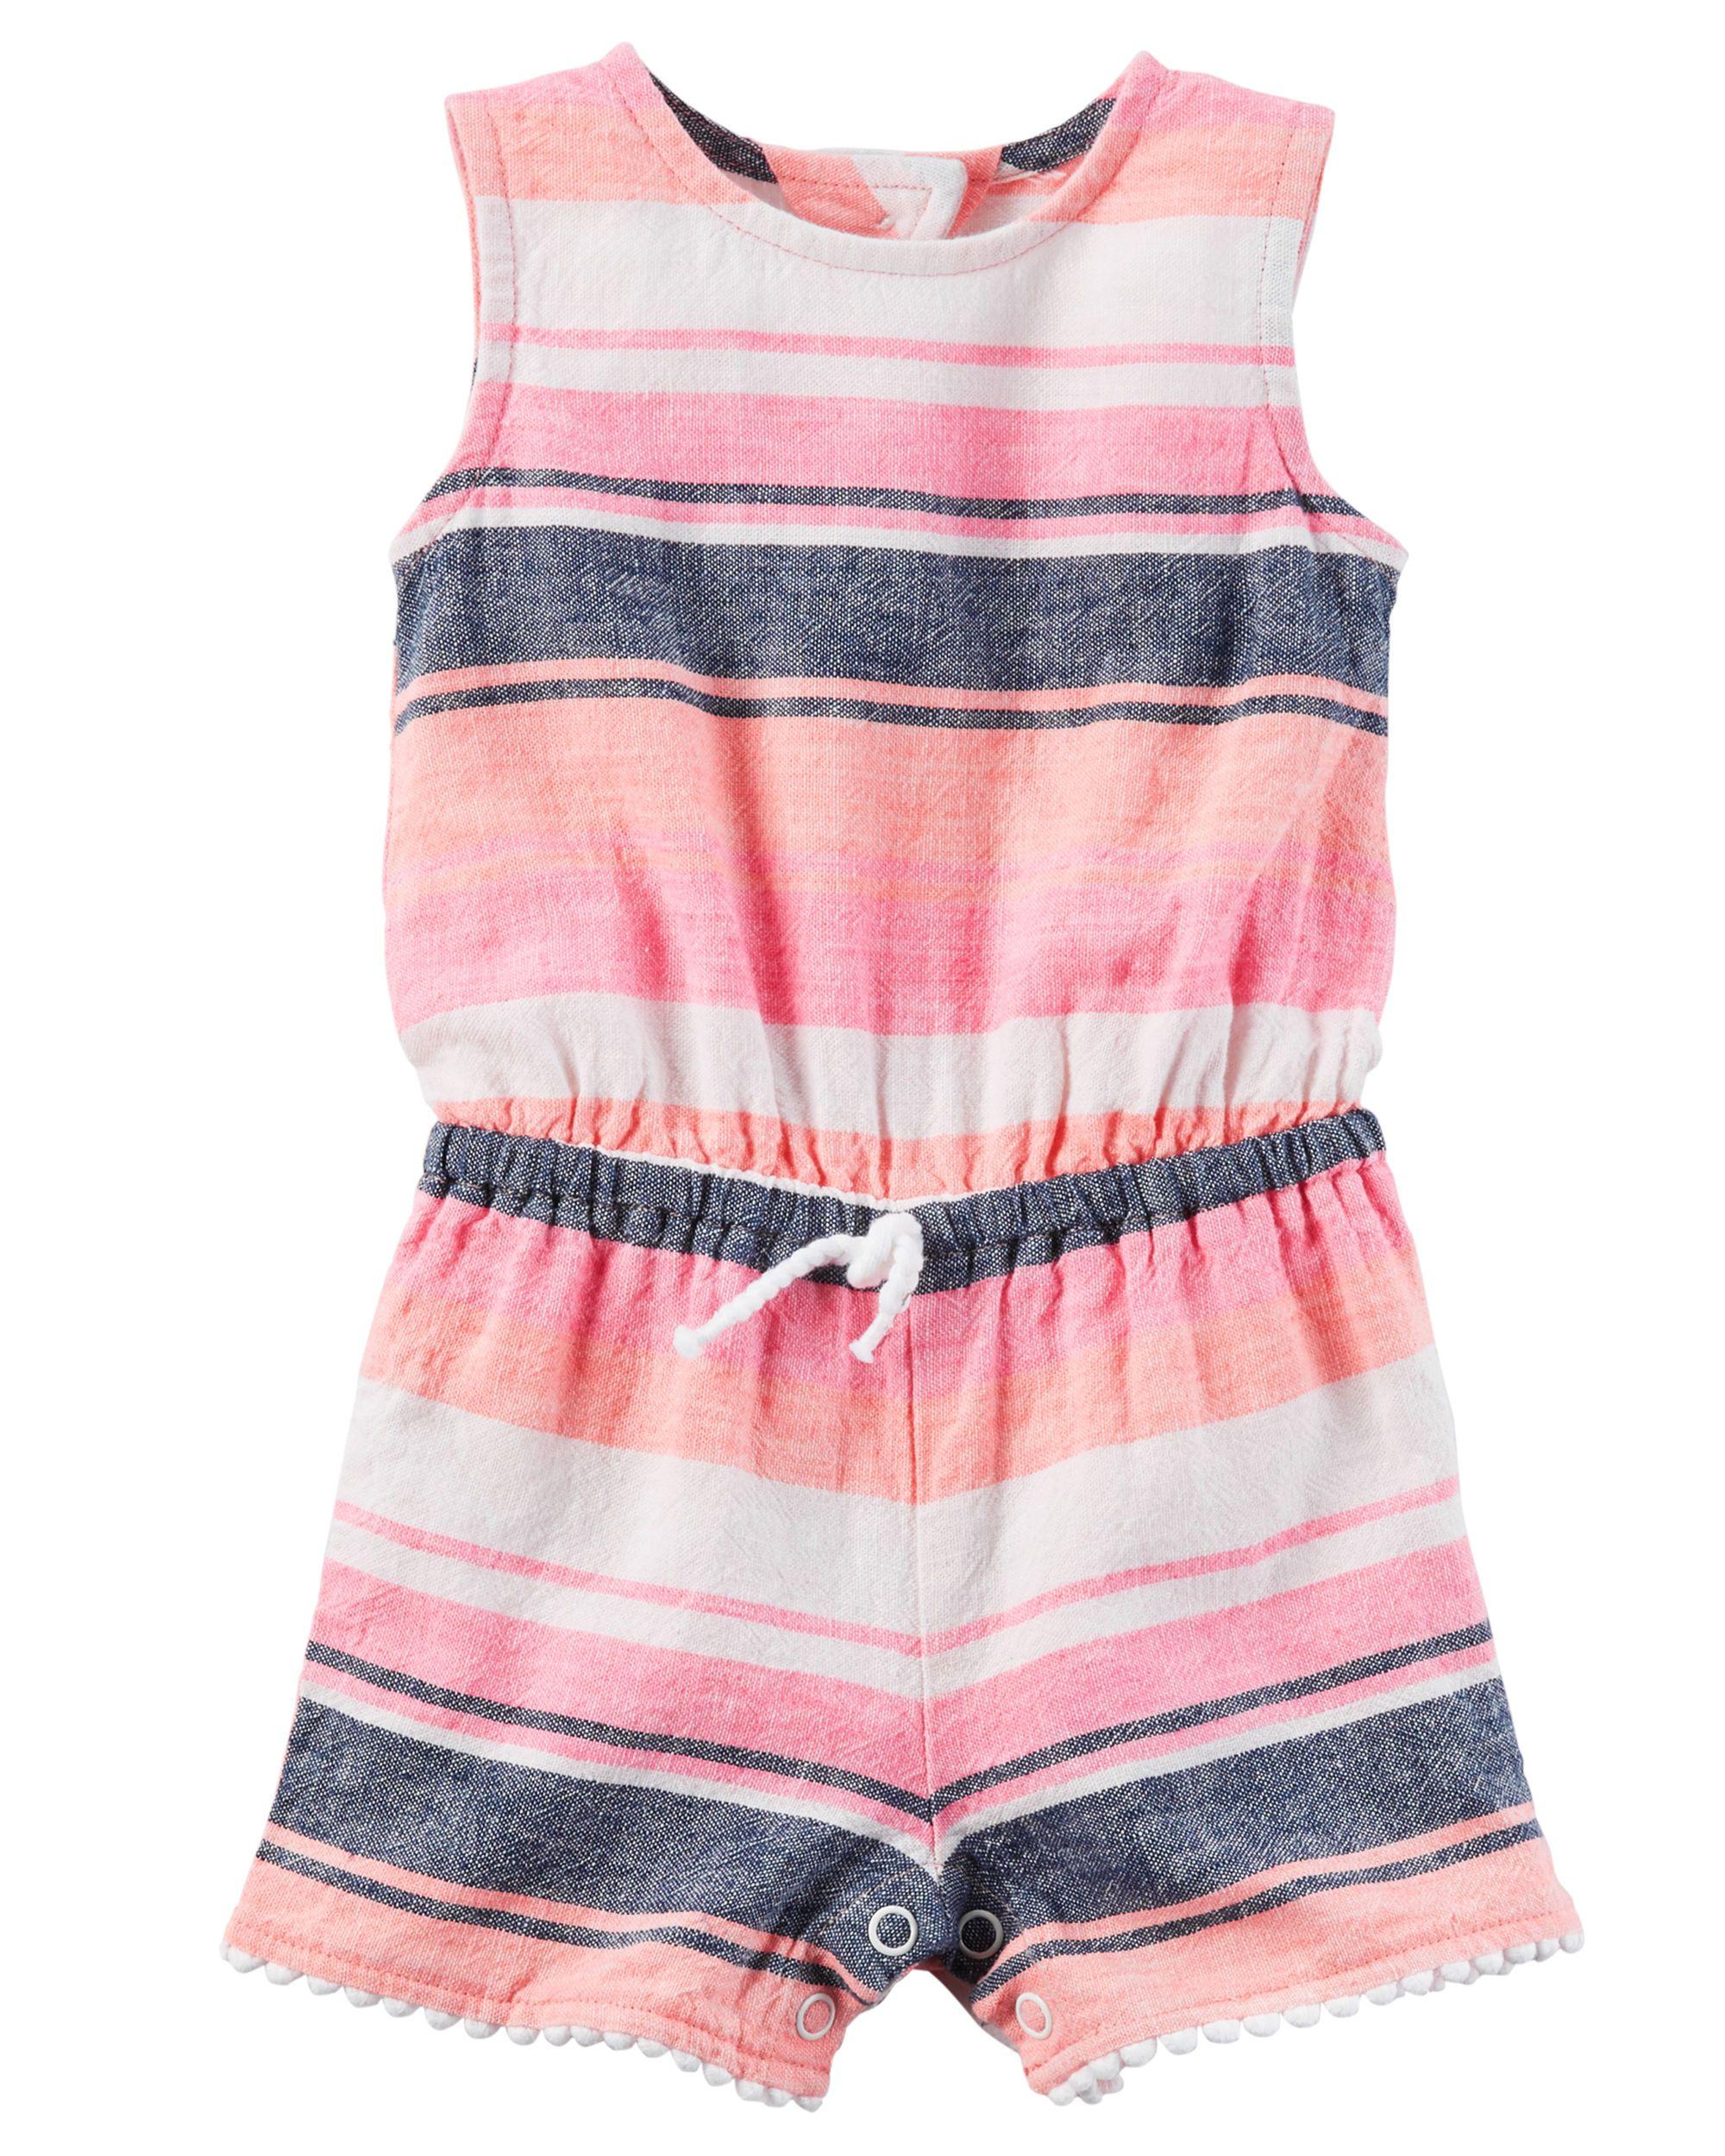 Baby Girl Striped Romper | Carters.com